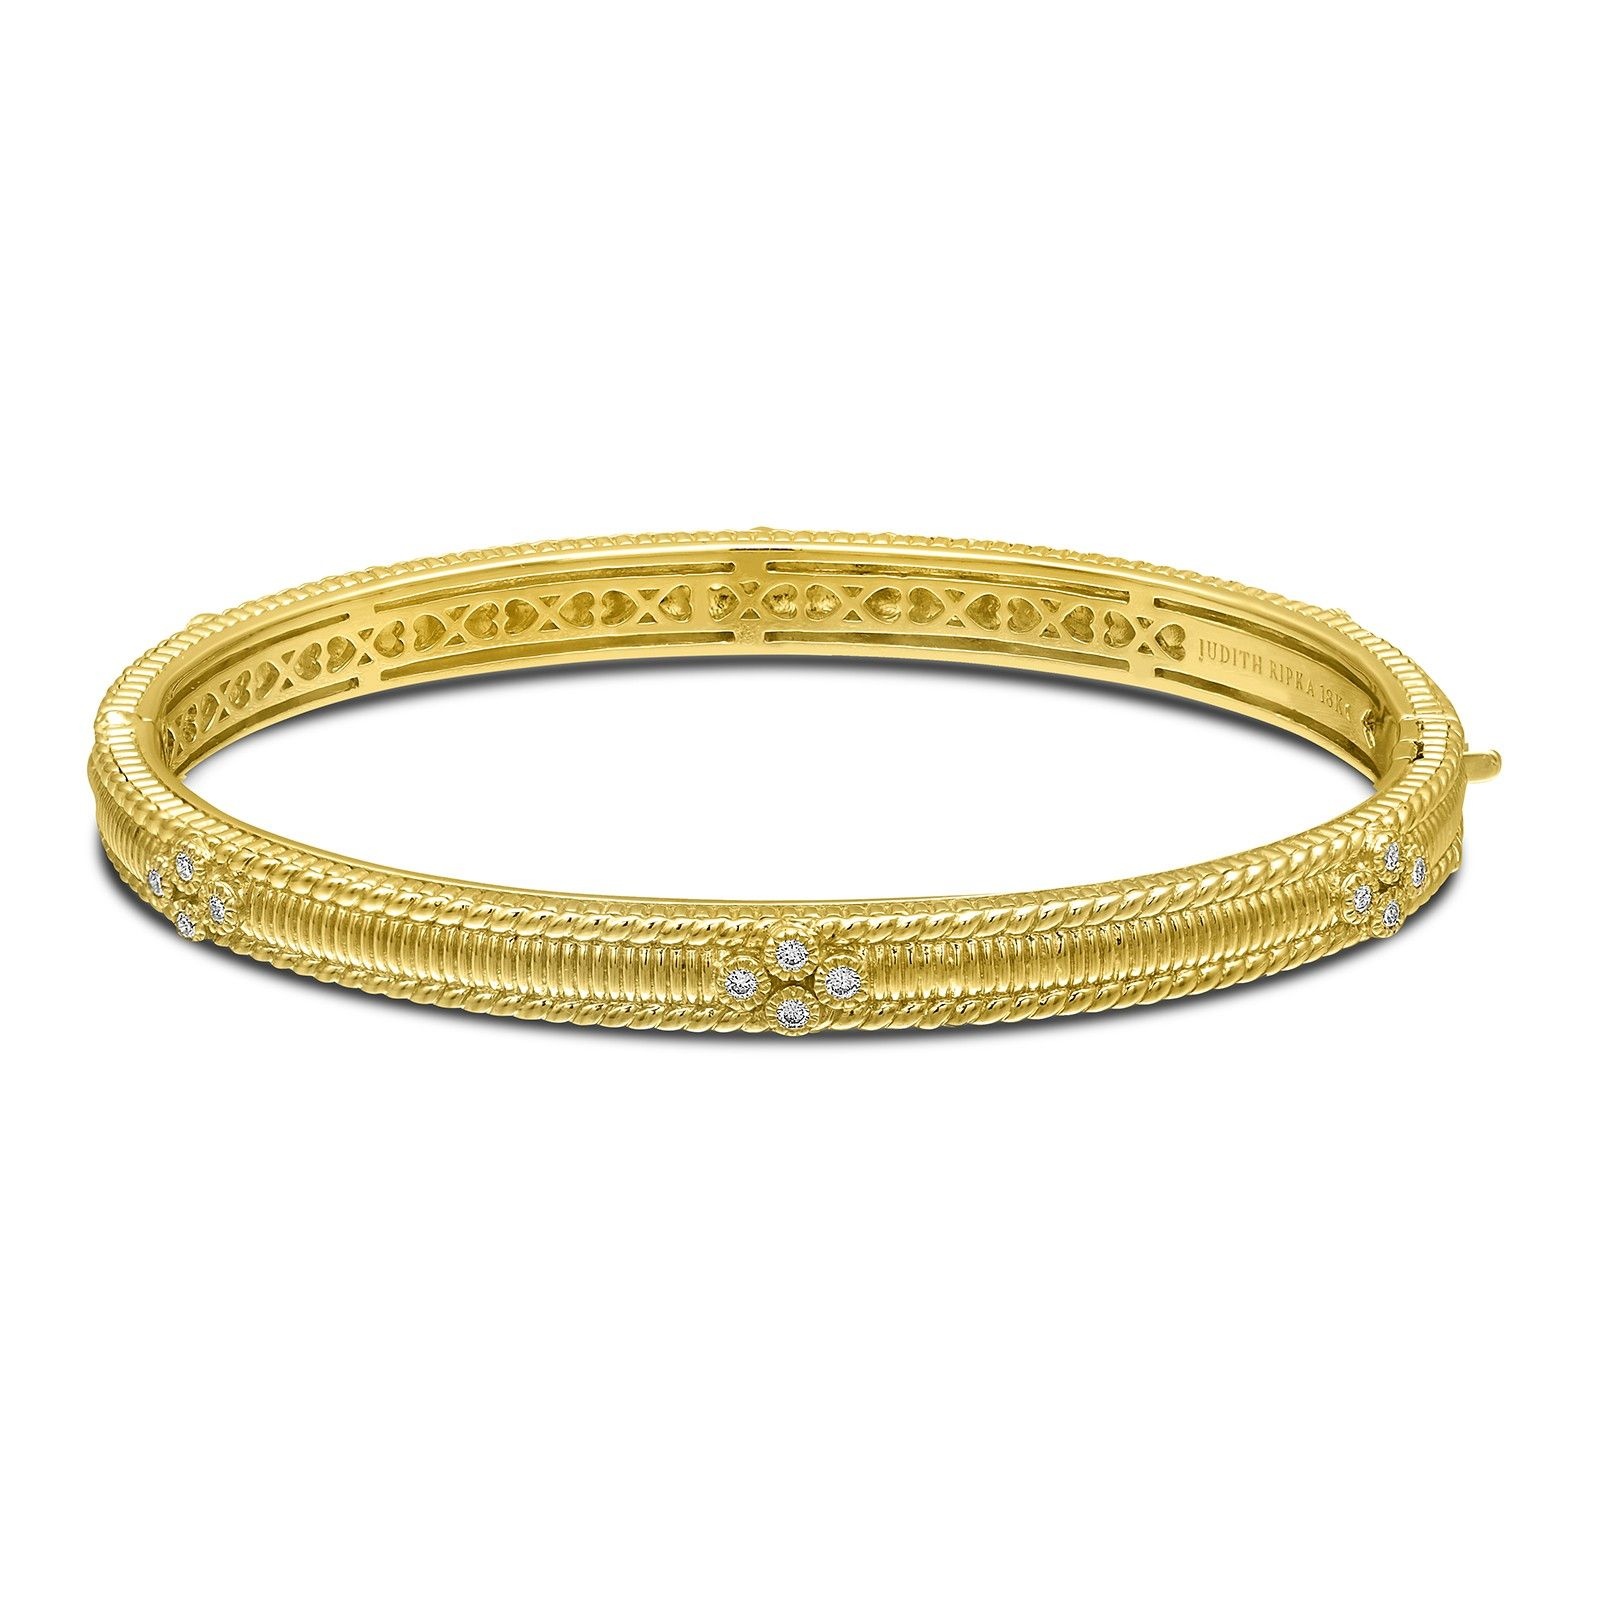 Judith Ripka 18KYG Berge Diamond Set Bangle Bracelet Judith Ripka